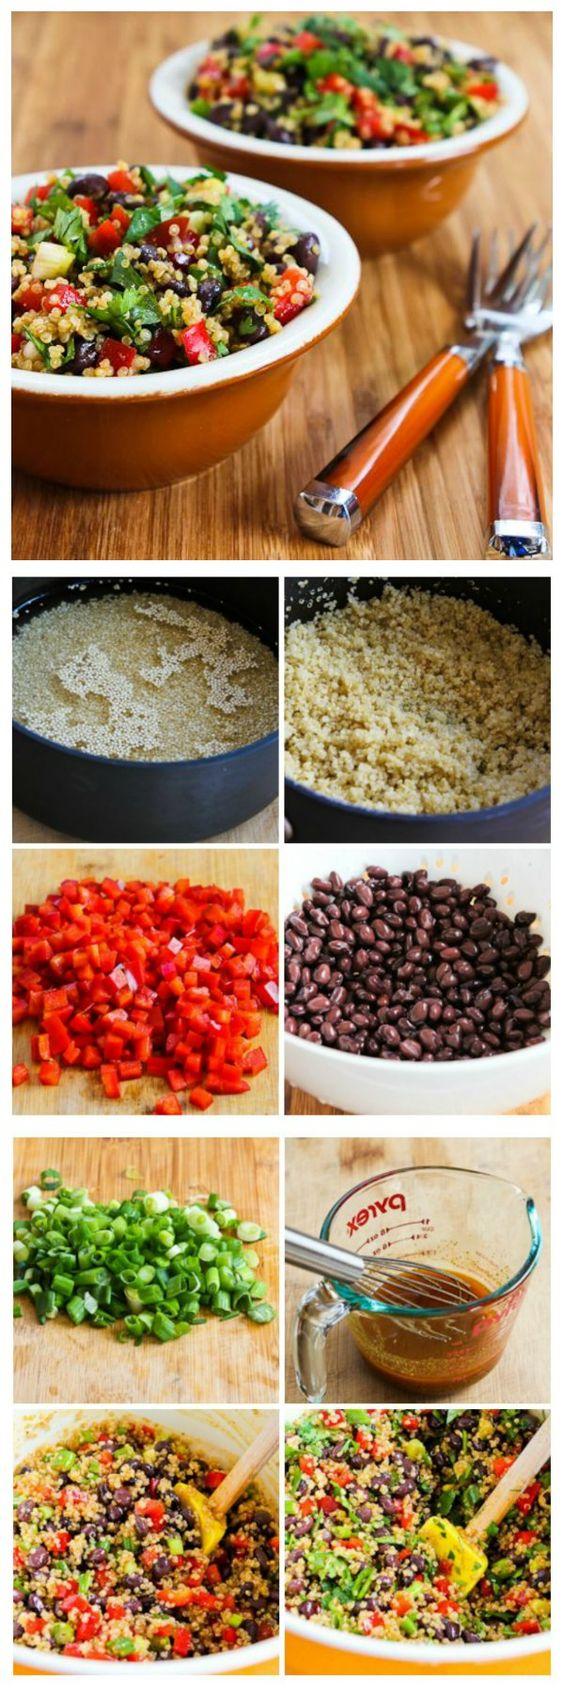 Quinoa Salad with Black Beans, Red Bell Pepper, and Cilantro | Quinoa ...